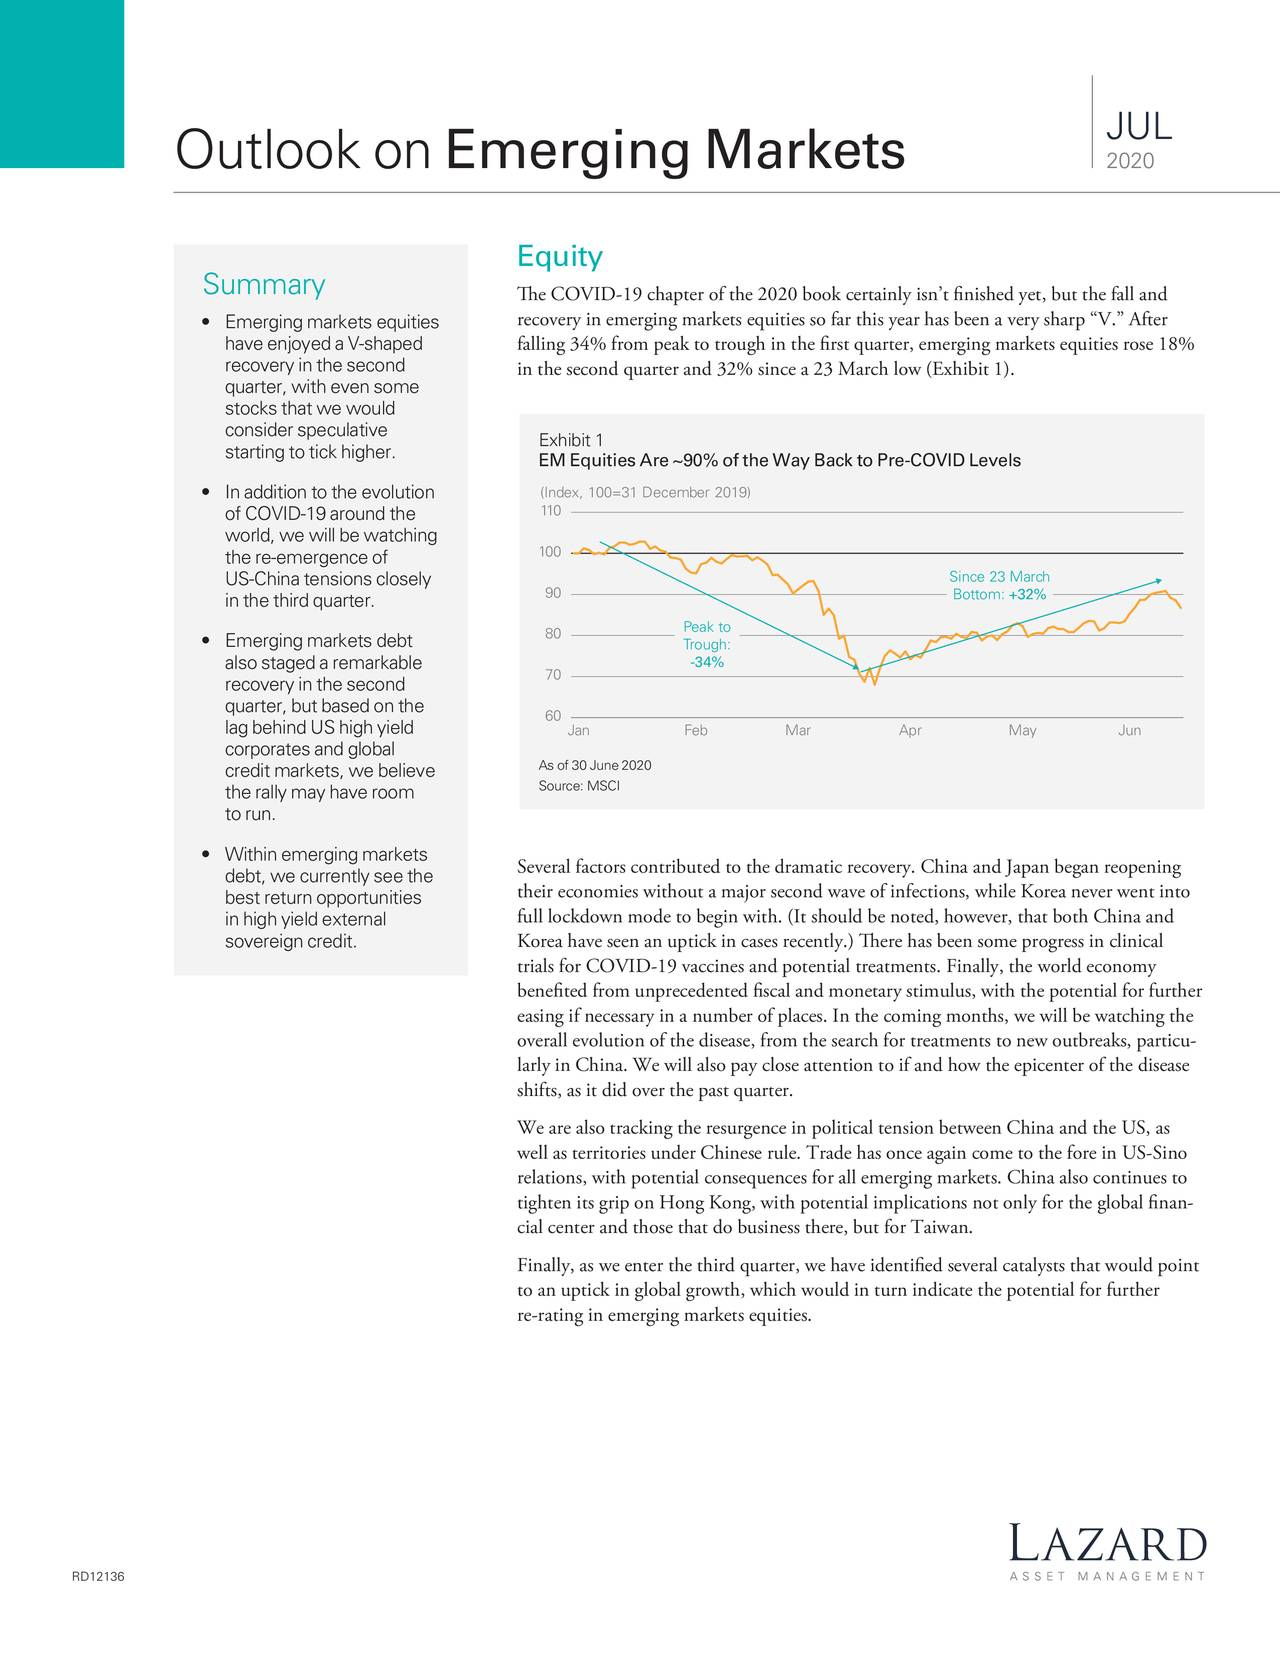 Lazard Asset Management - Outlook On Emerging Markets - July 2020